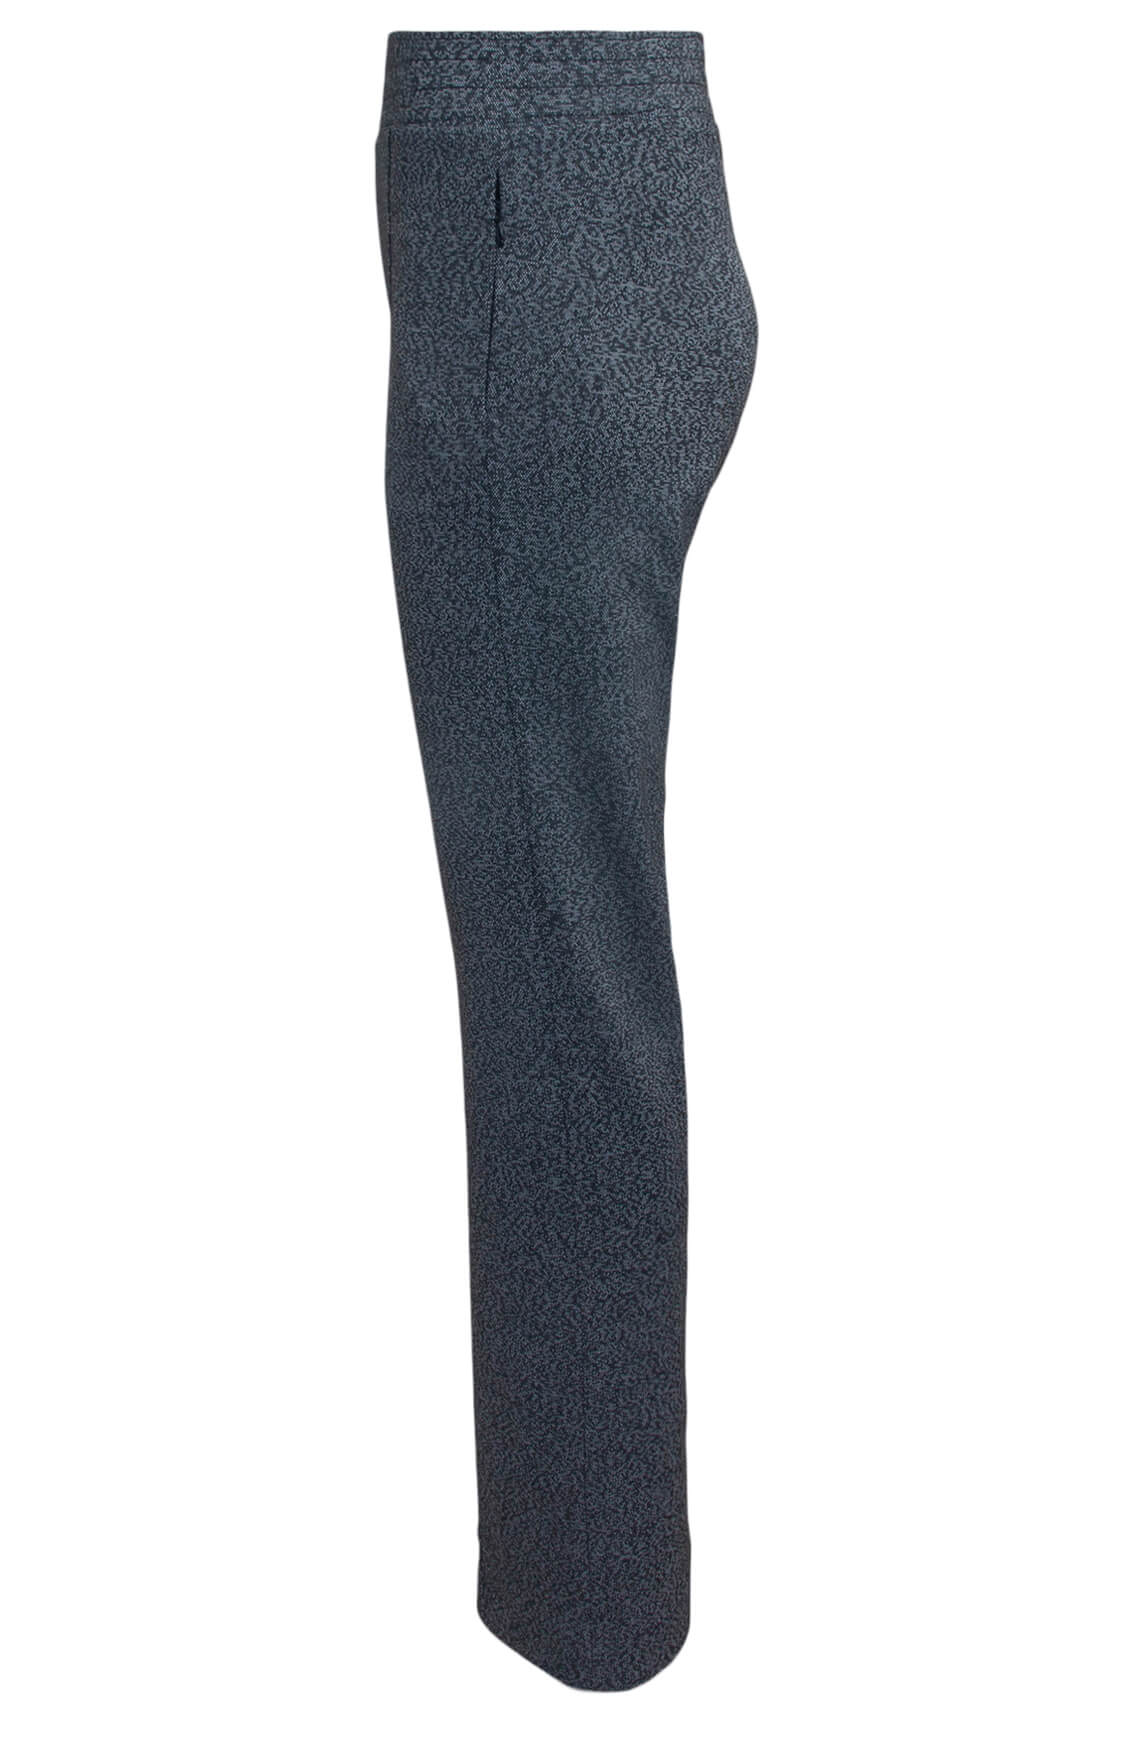 Anna Dames Gemêleerde broek zwart